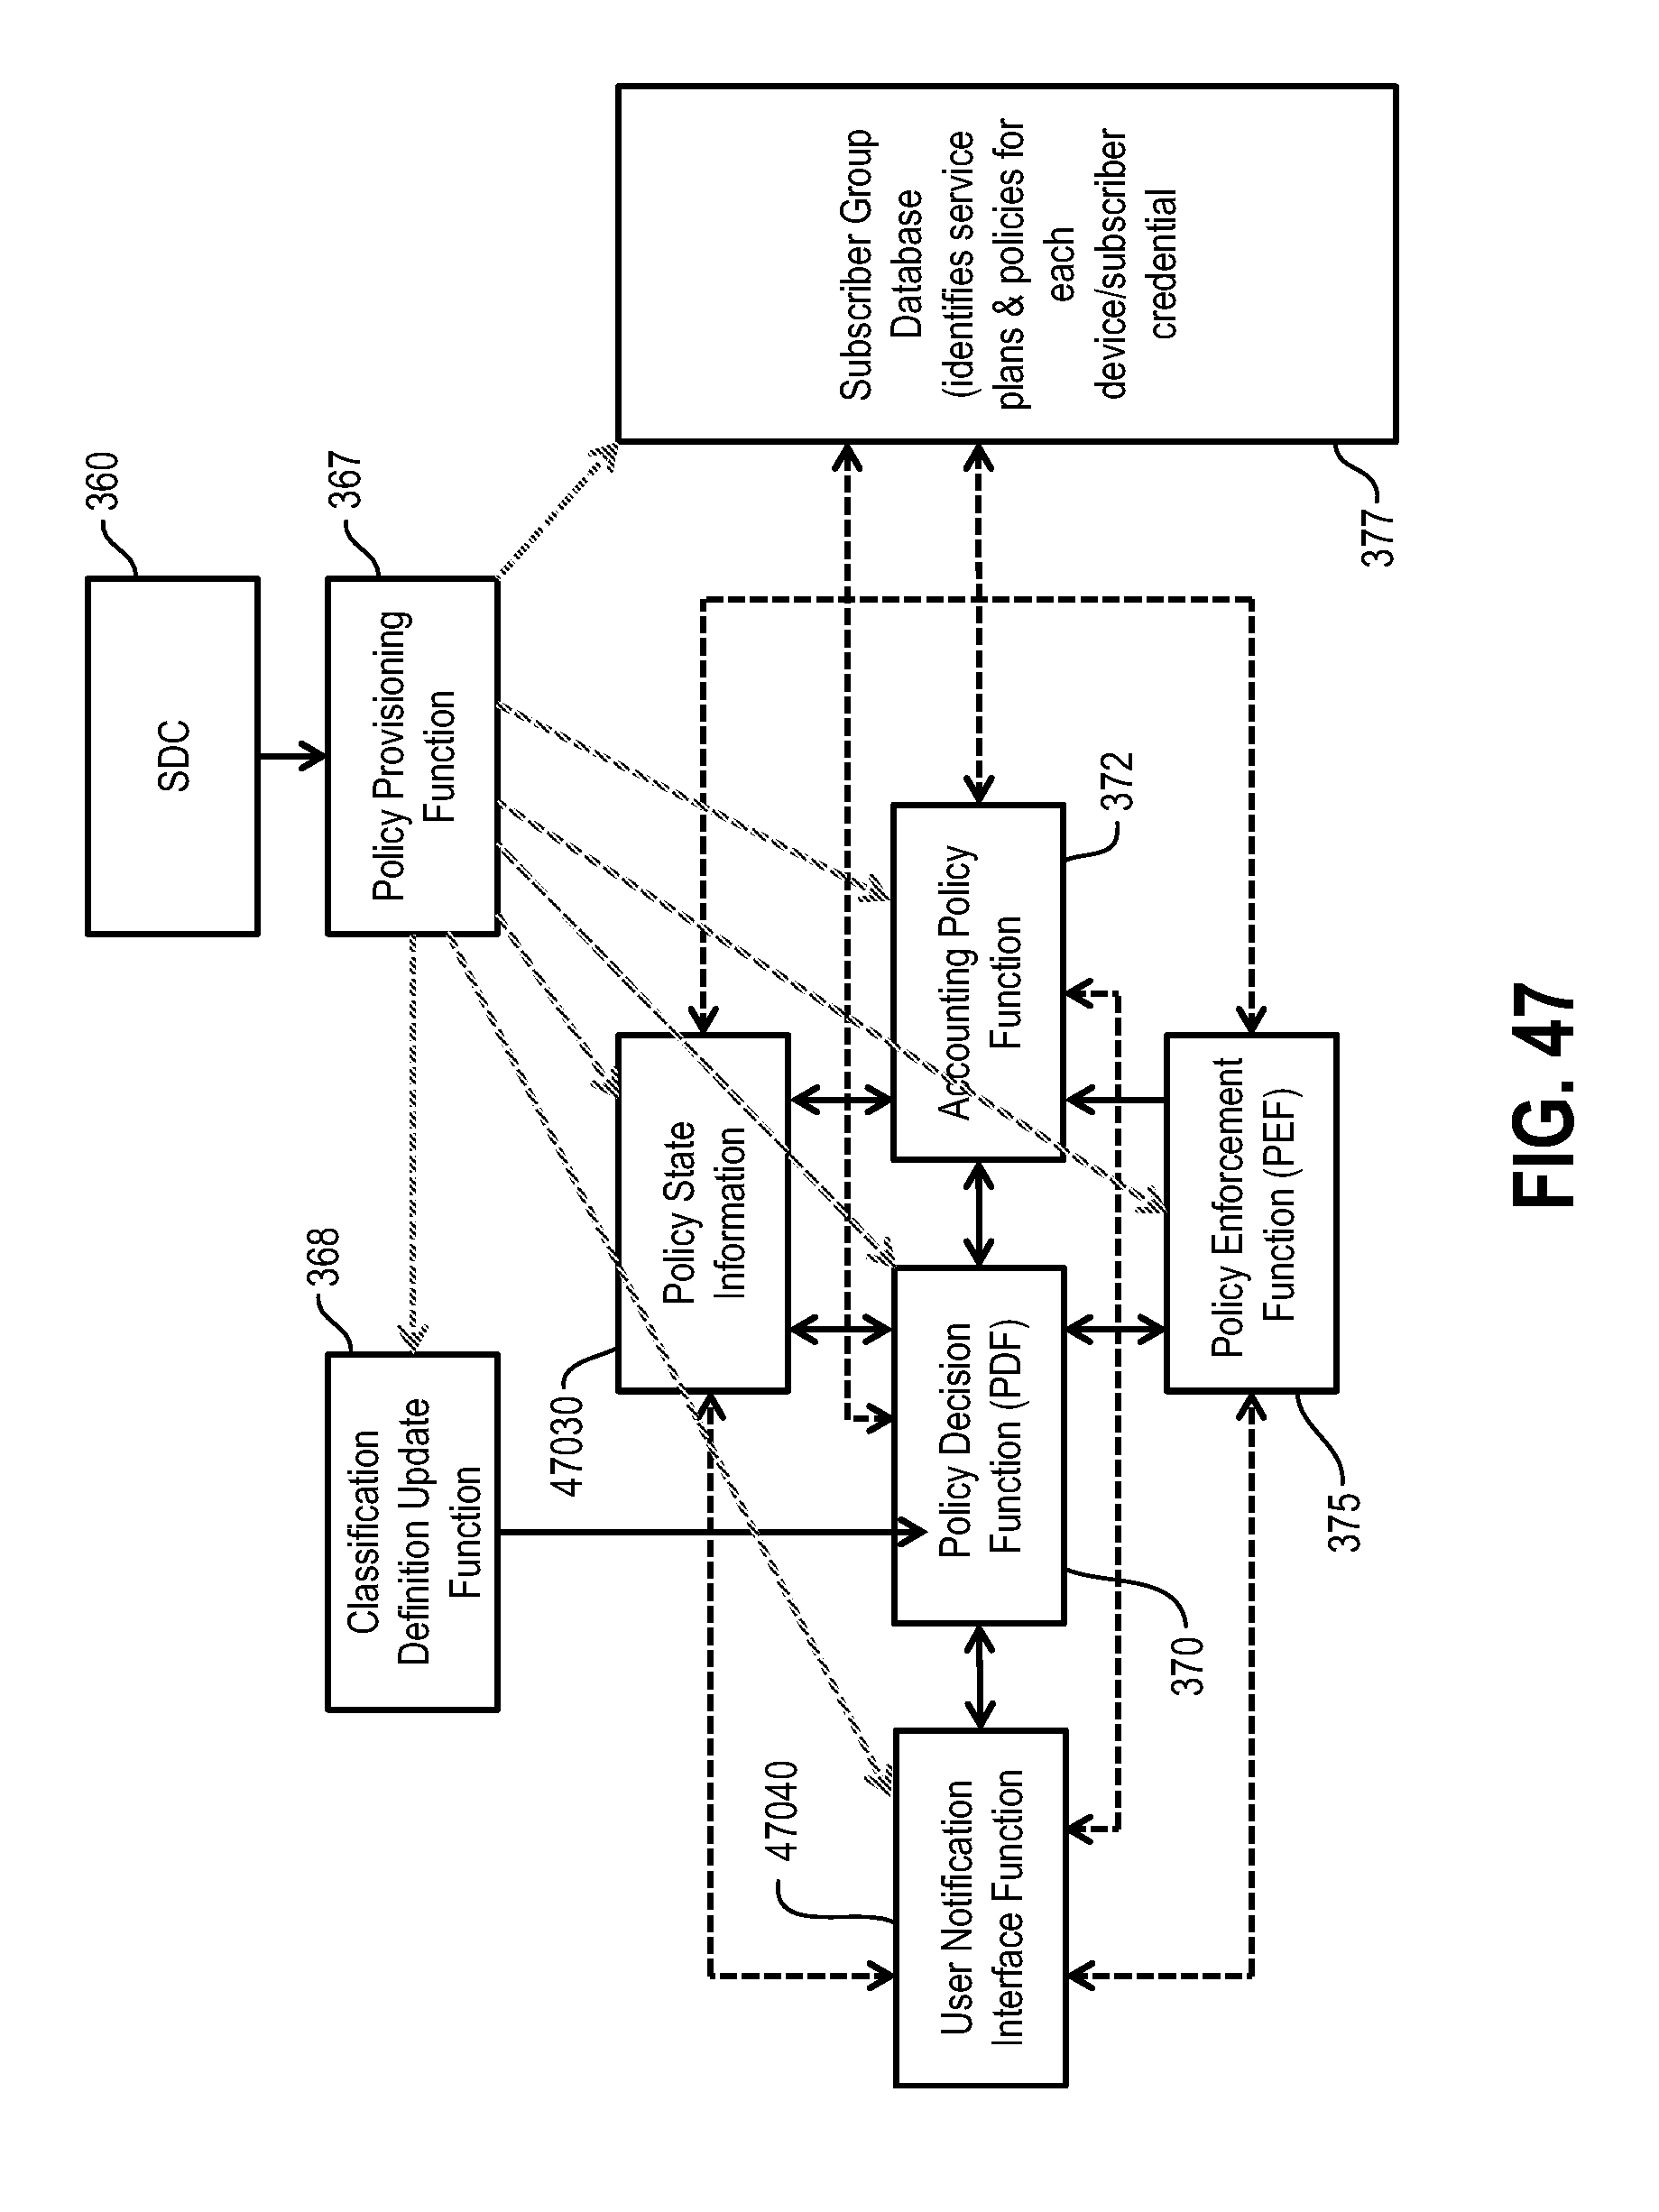 Free Download Atk Cap Pickup Wiring Diagram Detailed Schematics Blodgett Oven Patent Us 10057775 B2